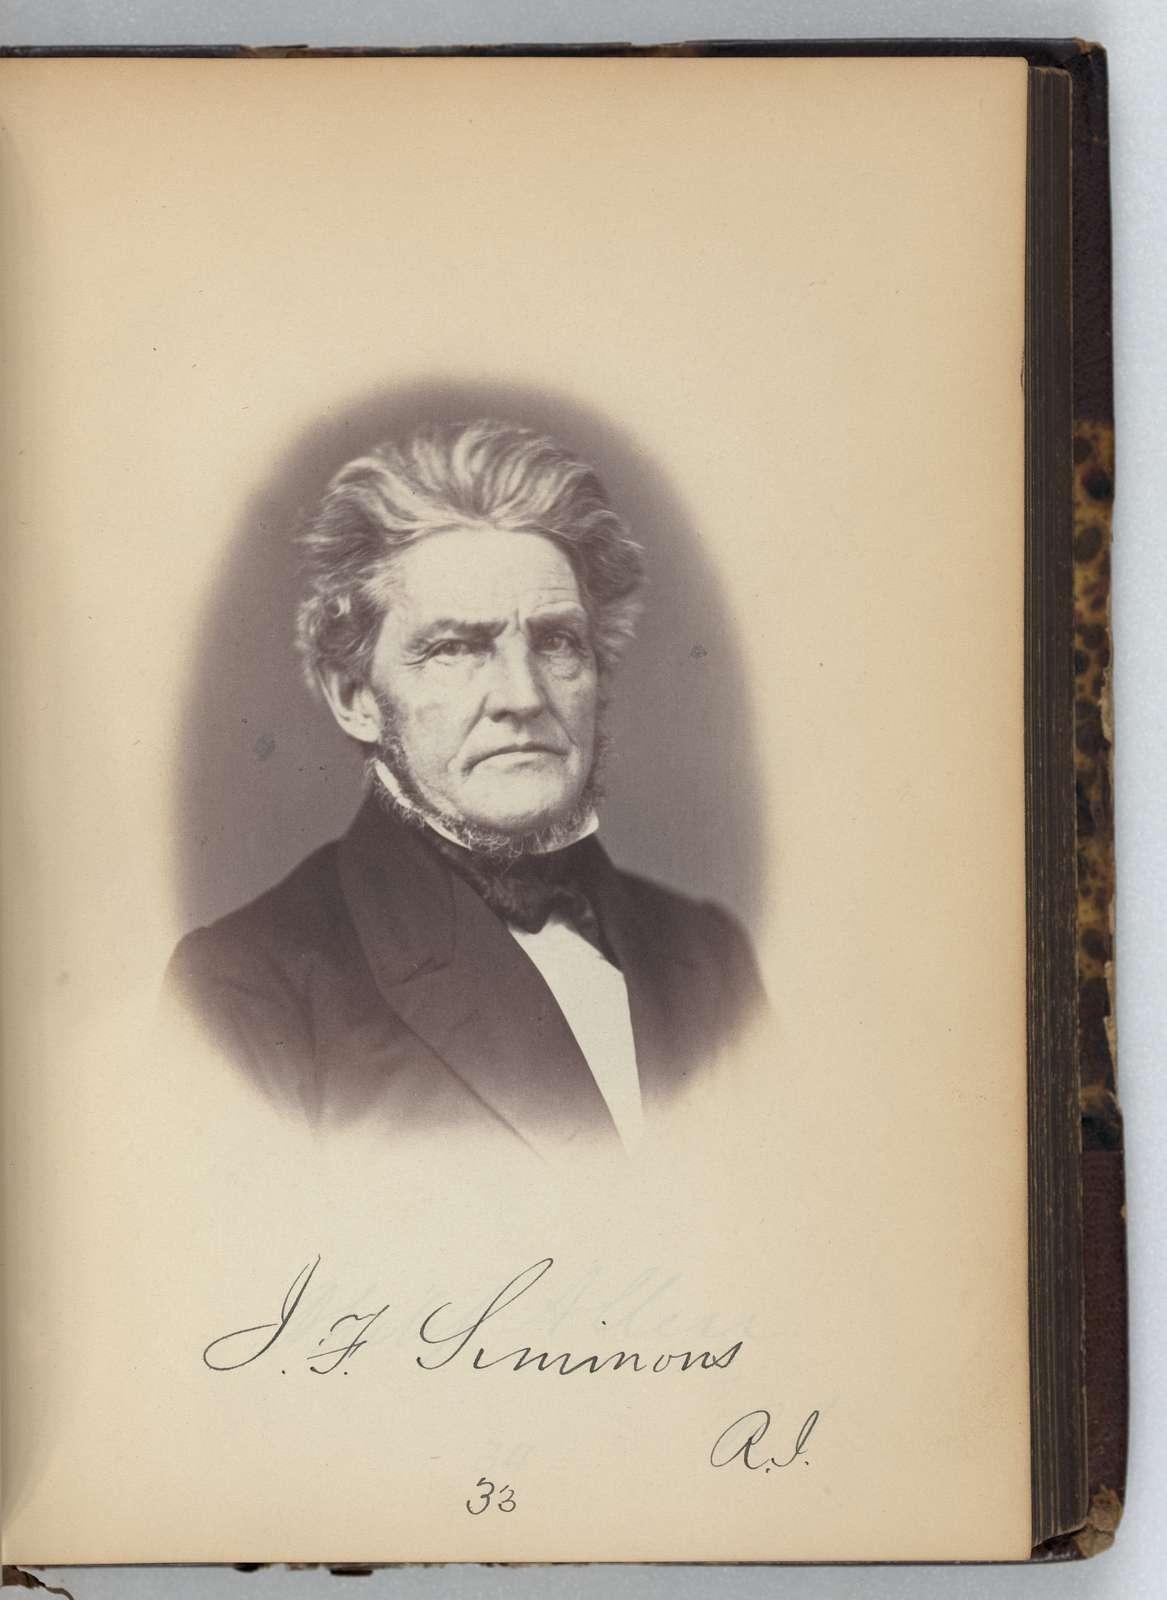 [James F. Simmons, Senator from Rhode Island, Thirty-fifth Congress, half-length portrait]